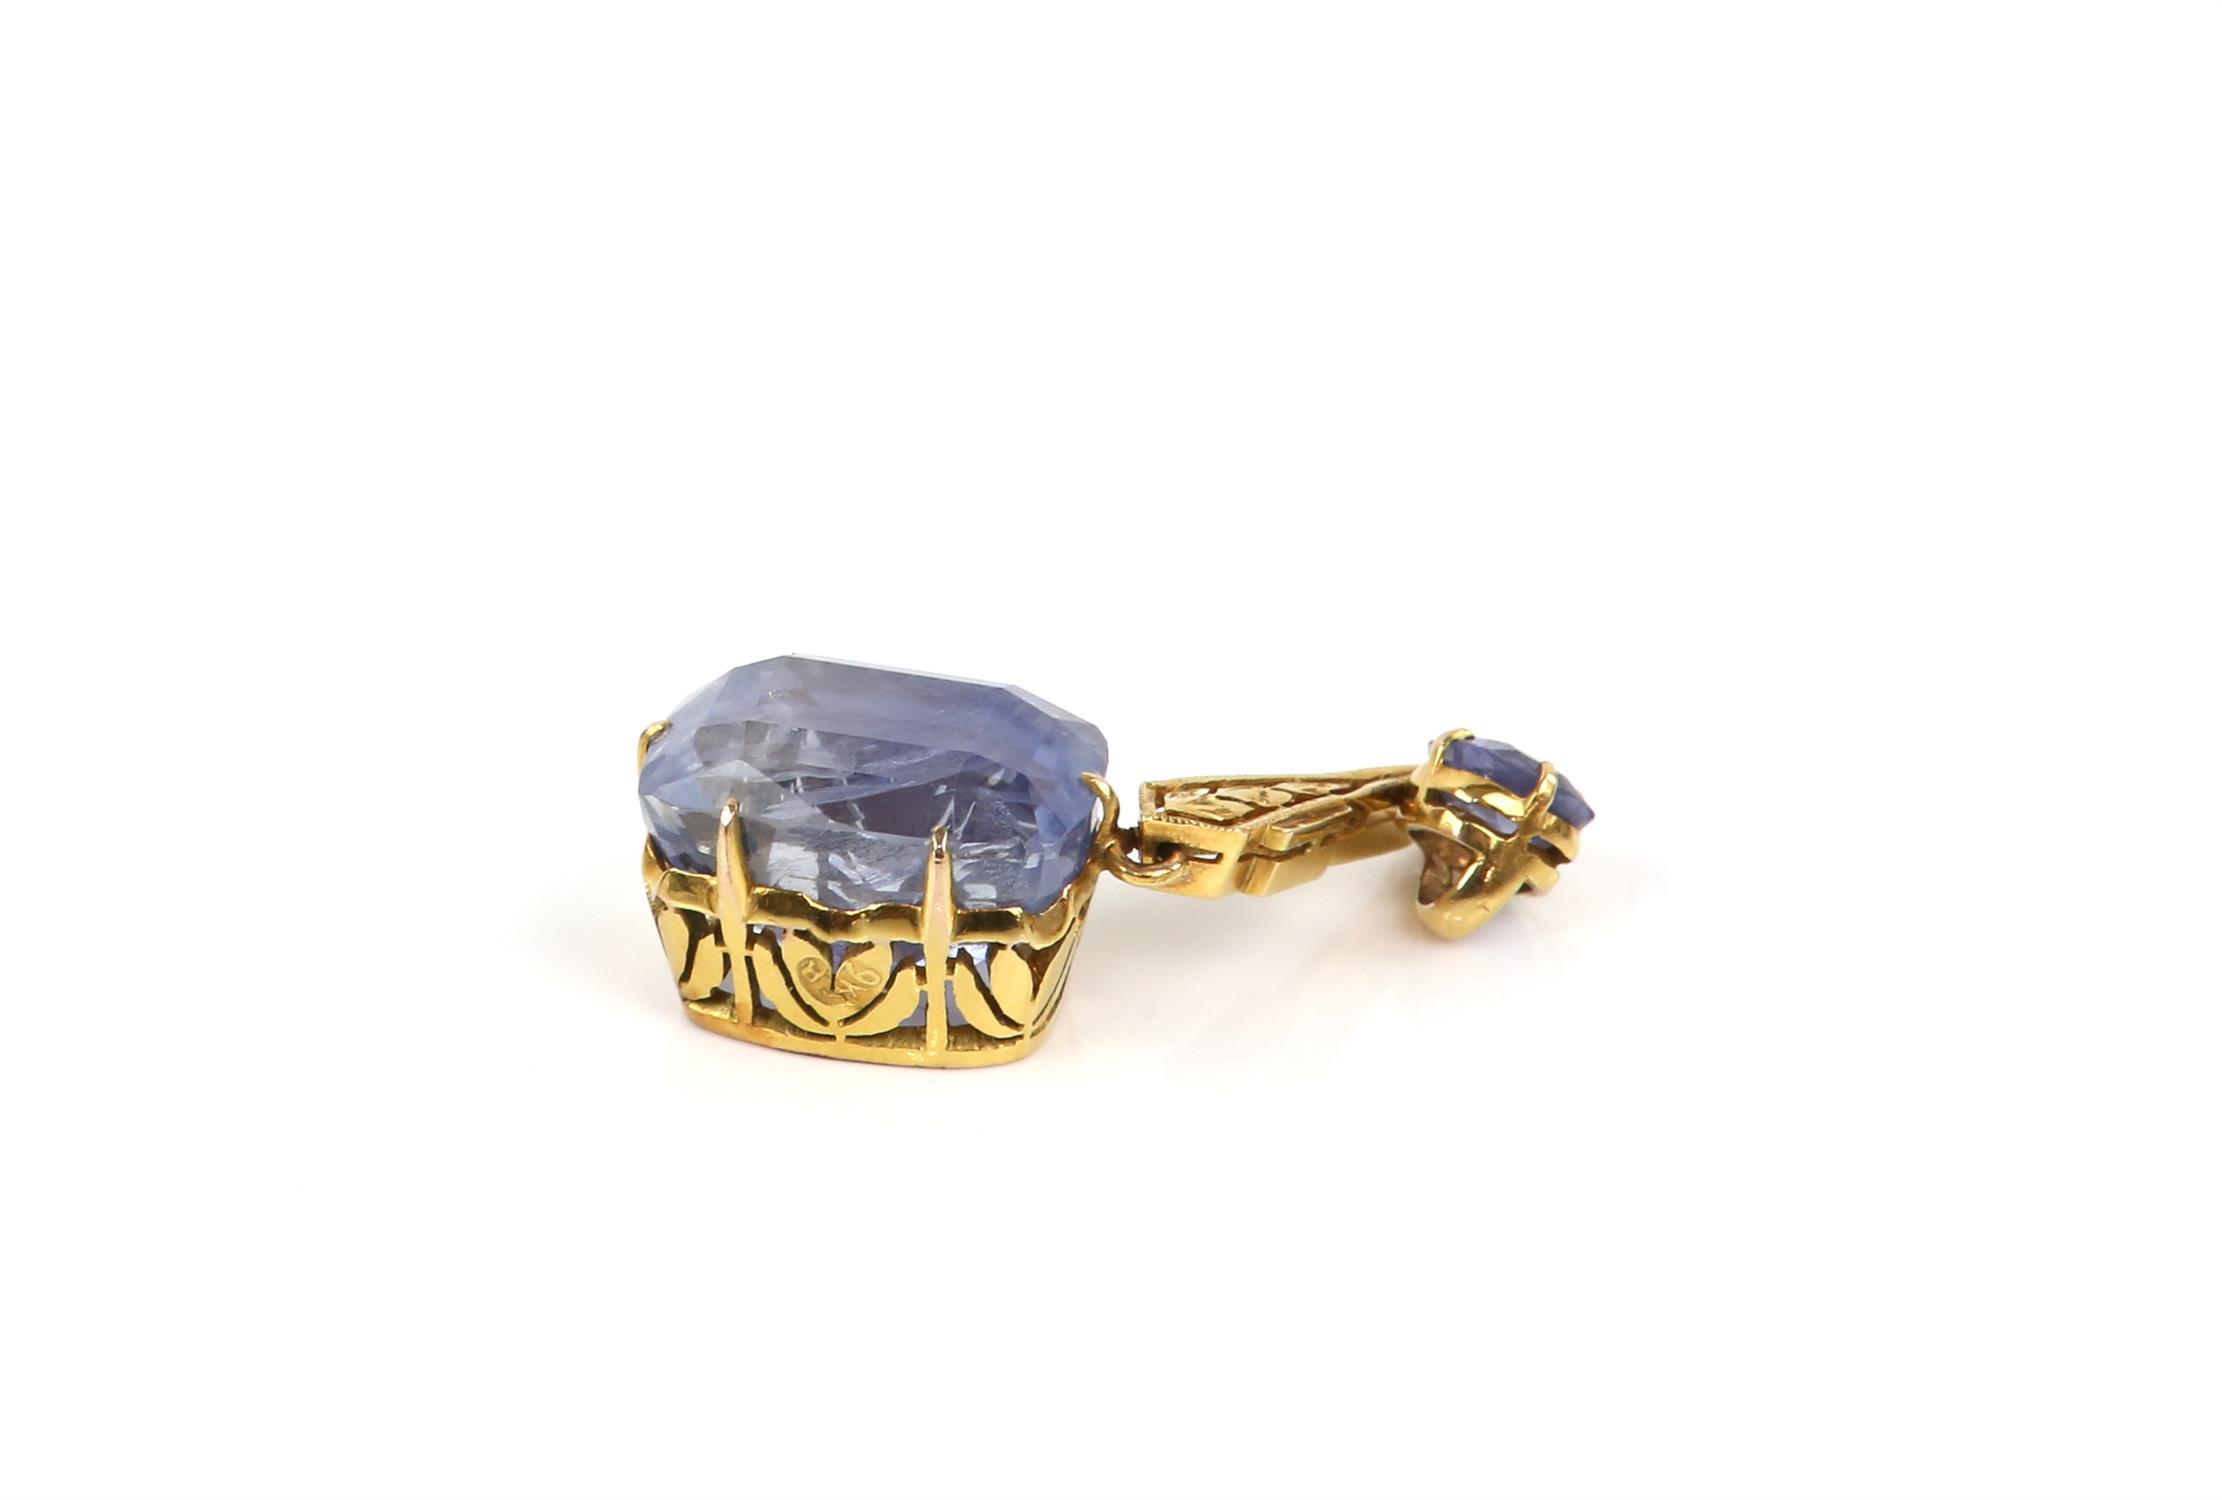 Sapphire drop pendant, principal light blue sapphire, estimated weight 12.99 carats, - Image 8 of 8